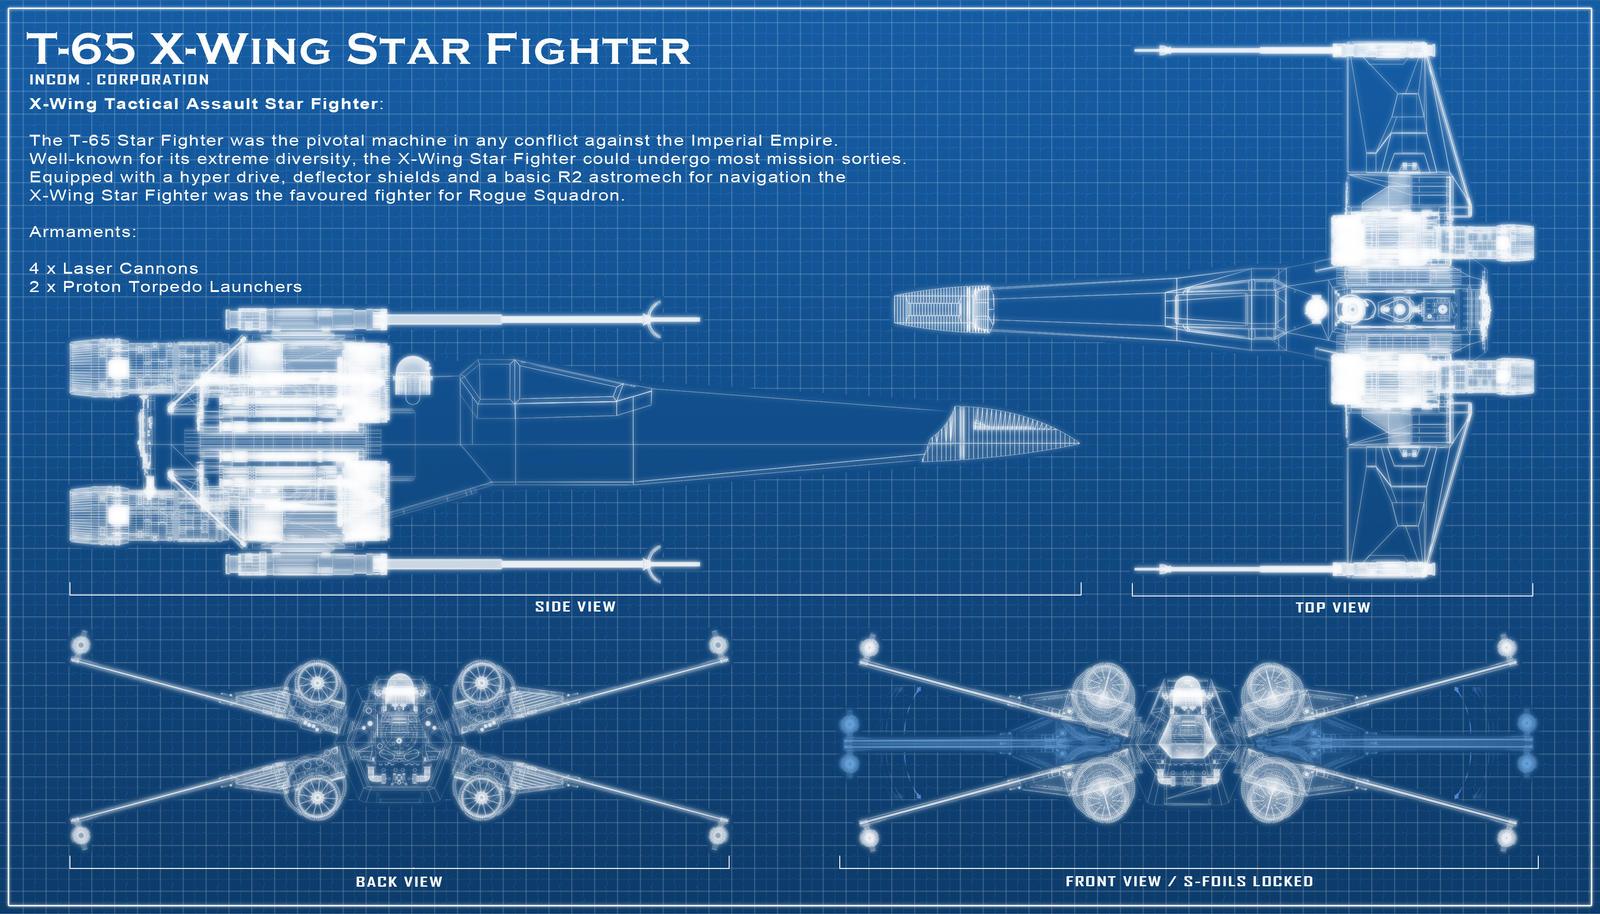 technical print - Idoa.heybe.co on tie interceptor schematics, at-at schematics, slave 1 schematics, minecraft schematics, y-wing schematics, a wing fighter schematics, halo warthog schematics, b-wing schematics,